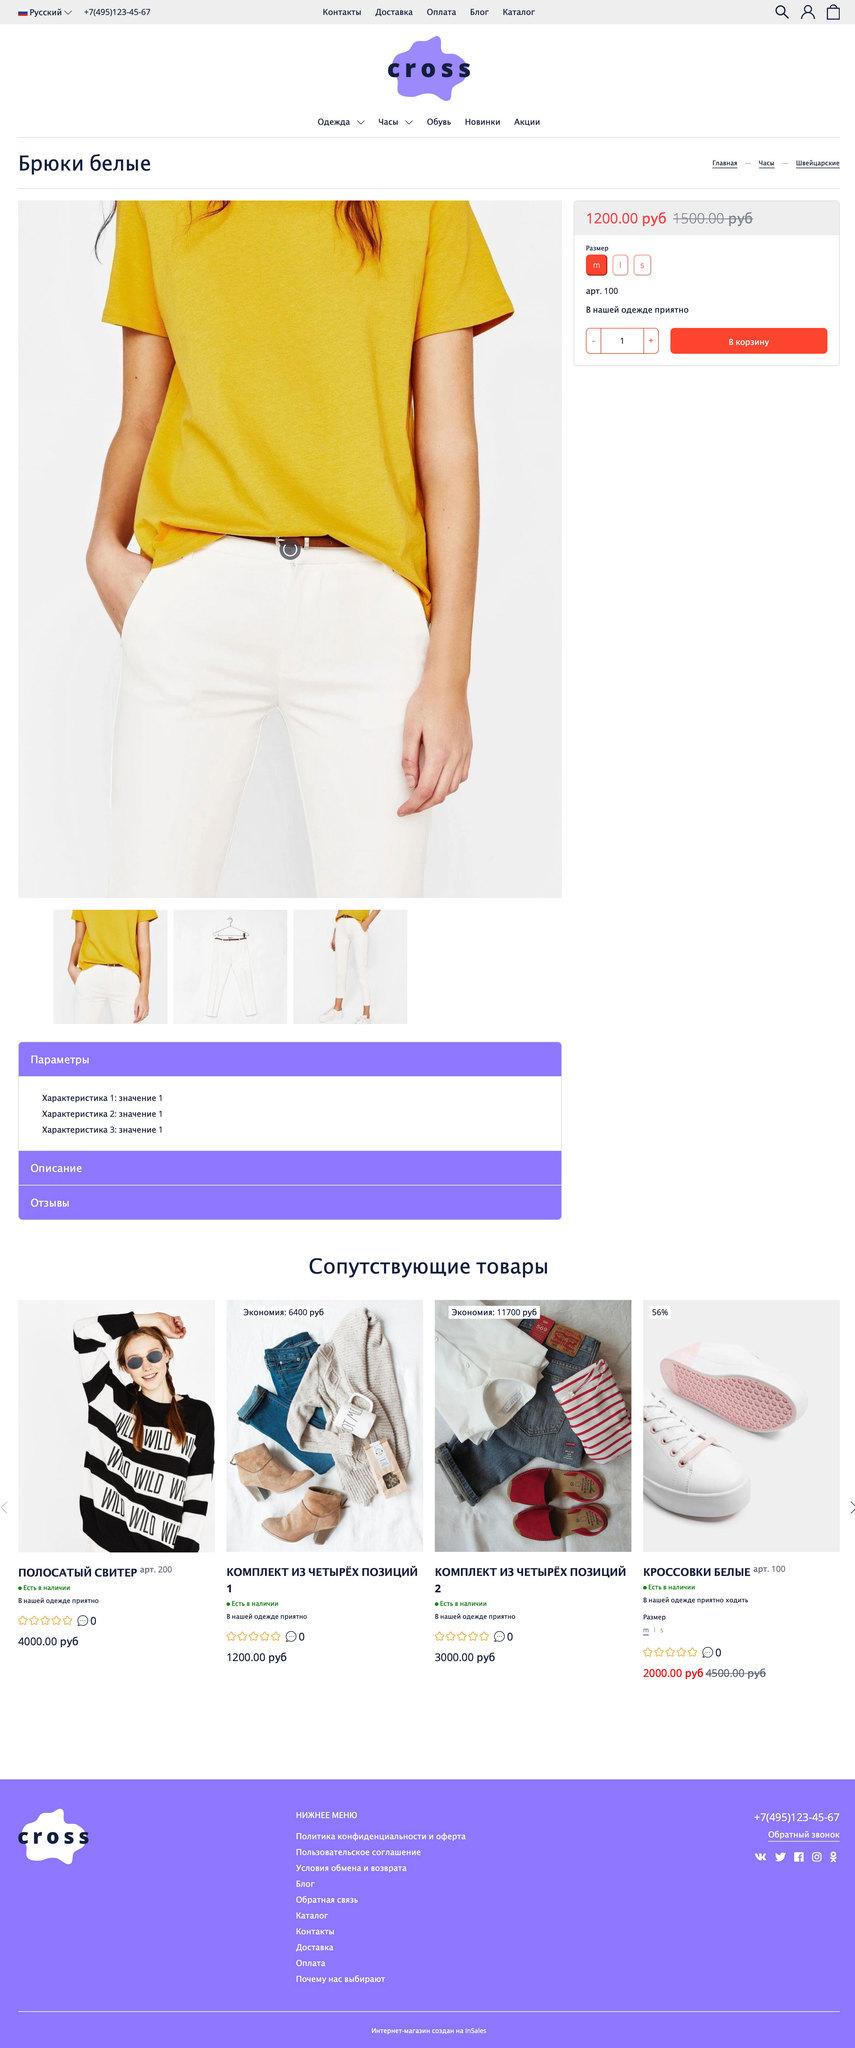 Шаблон интернет магазина - Cross